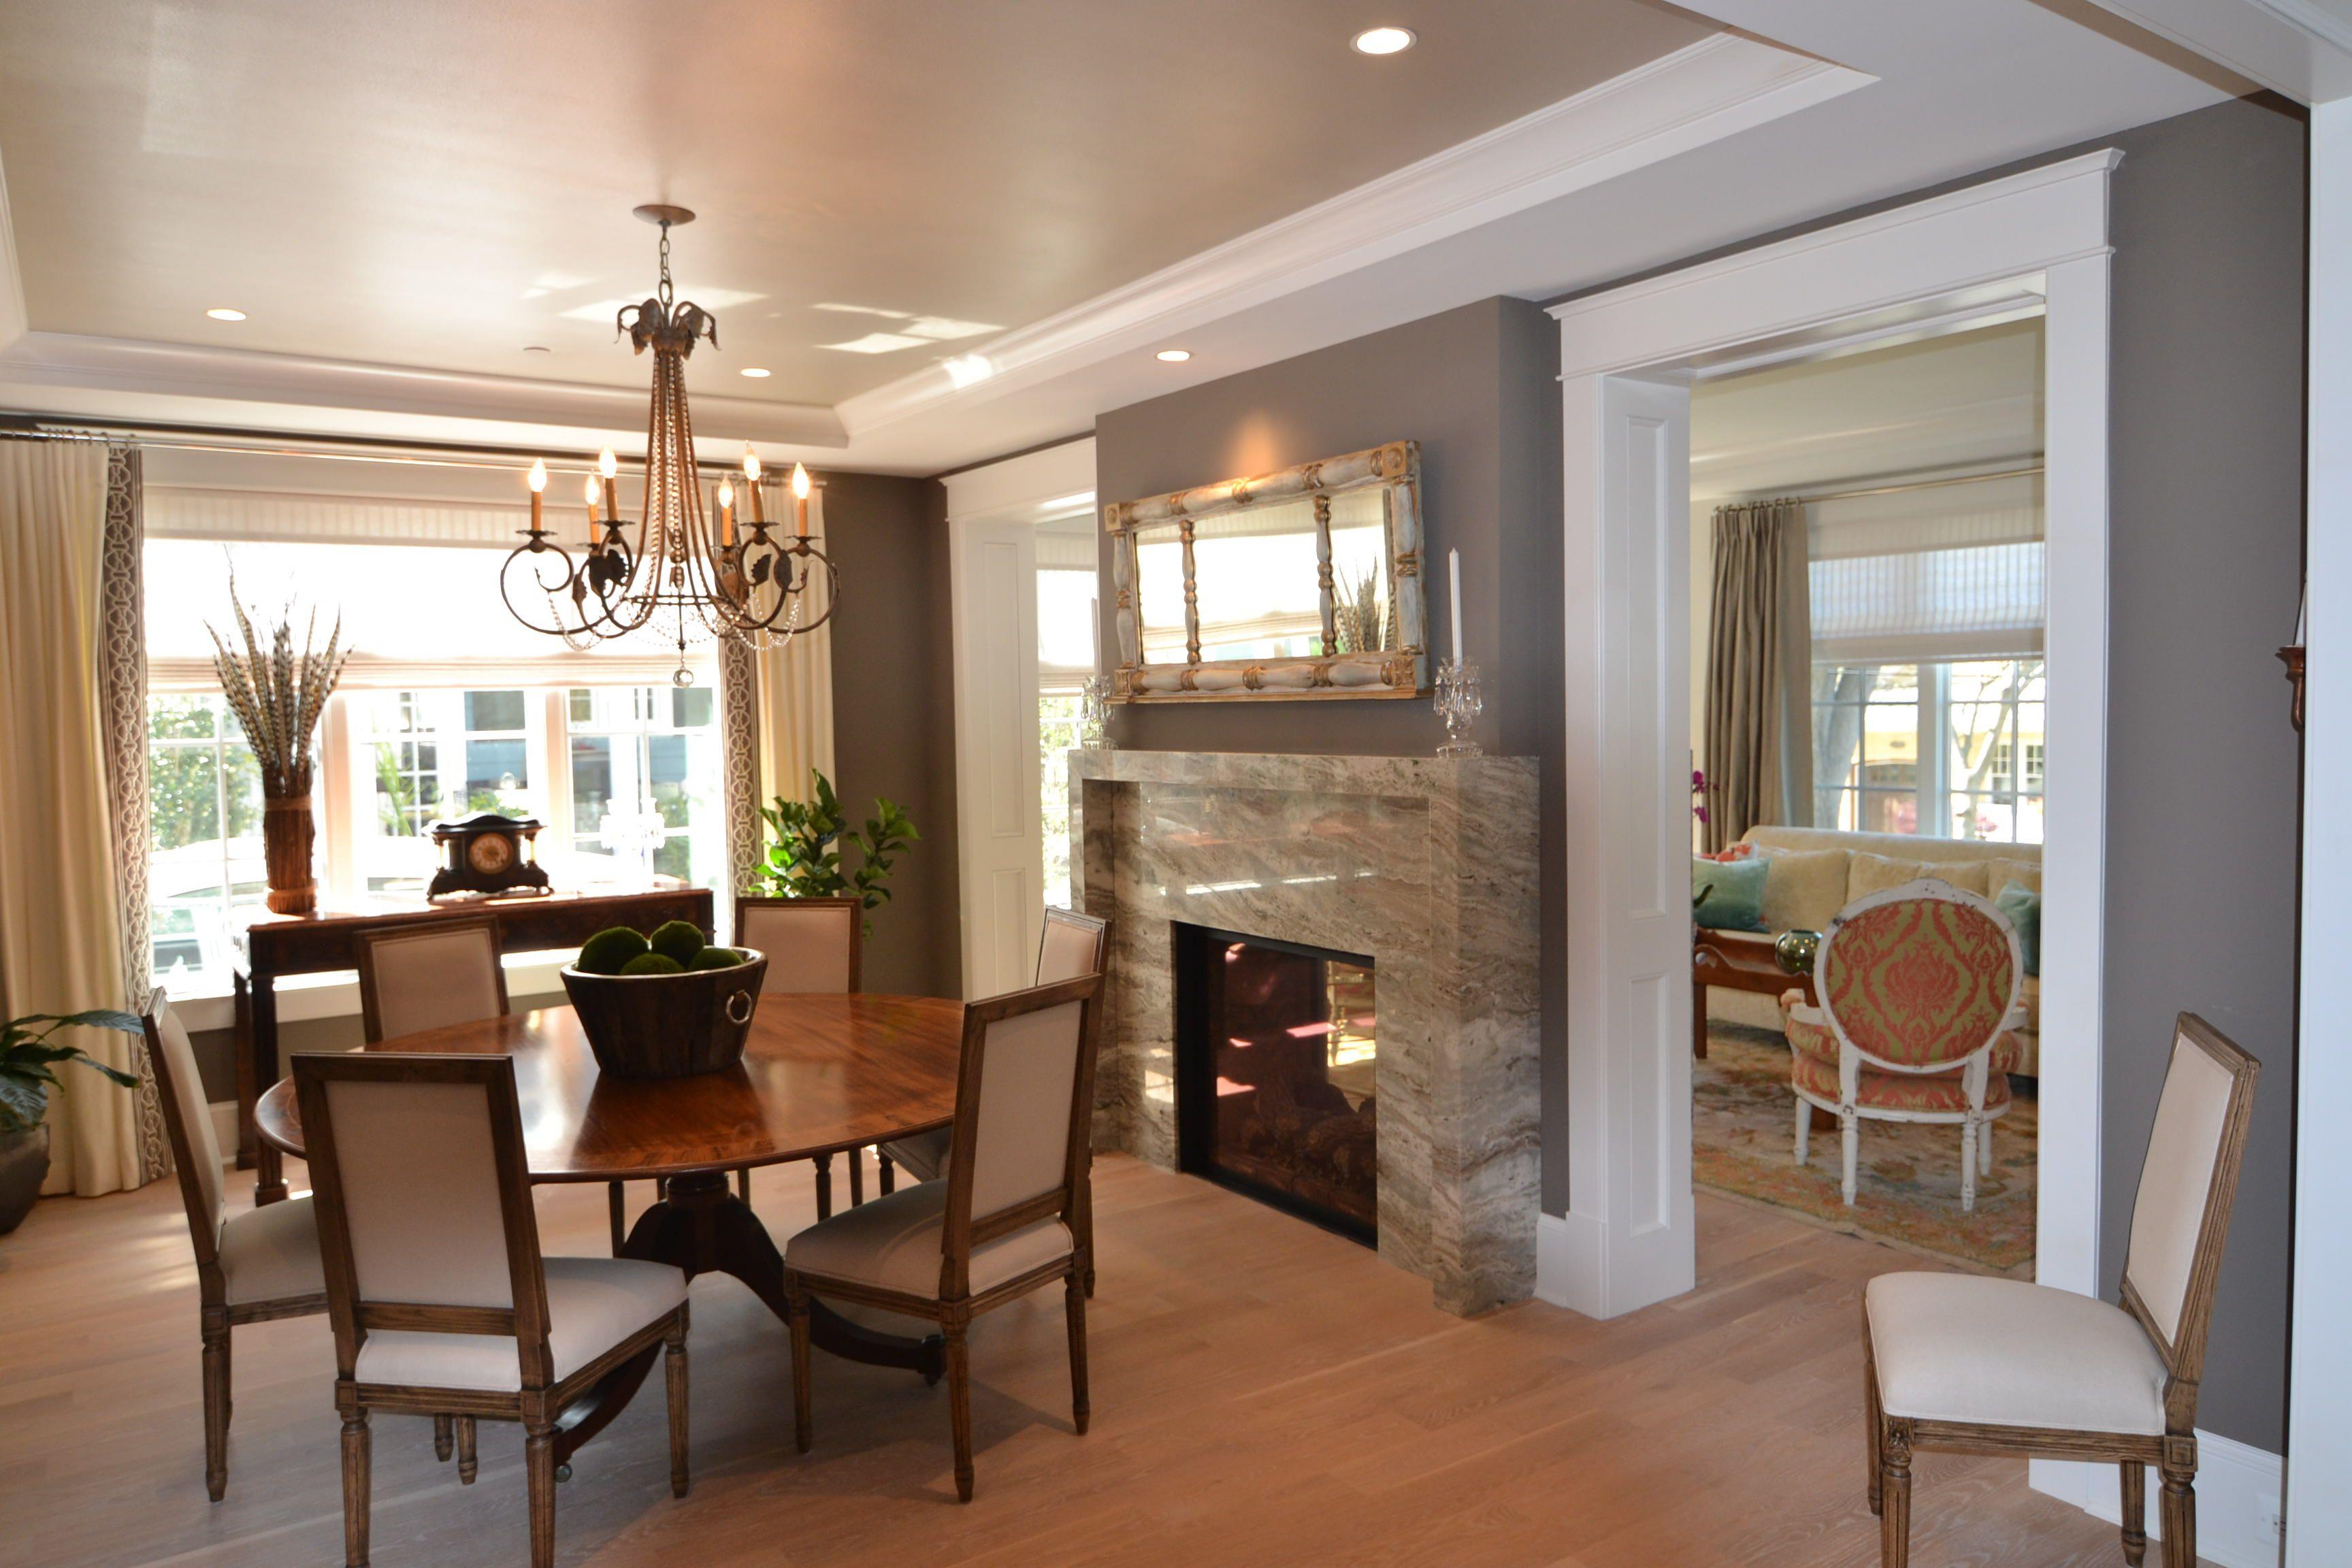 Marvelous Studio Z Home Design Part - 2: GOLD AWARD Custom Home Between 3,500-5,000 Sq. Ft. Studio Z Design Concepts